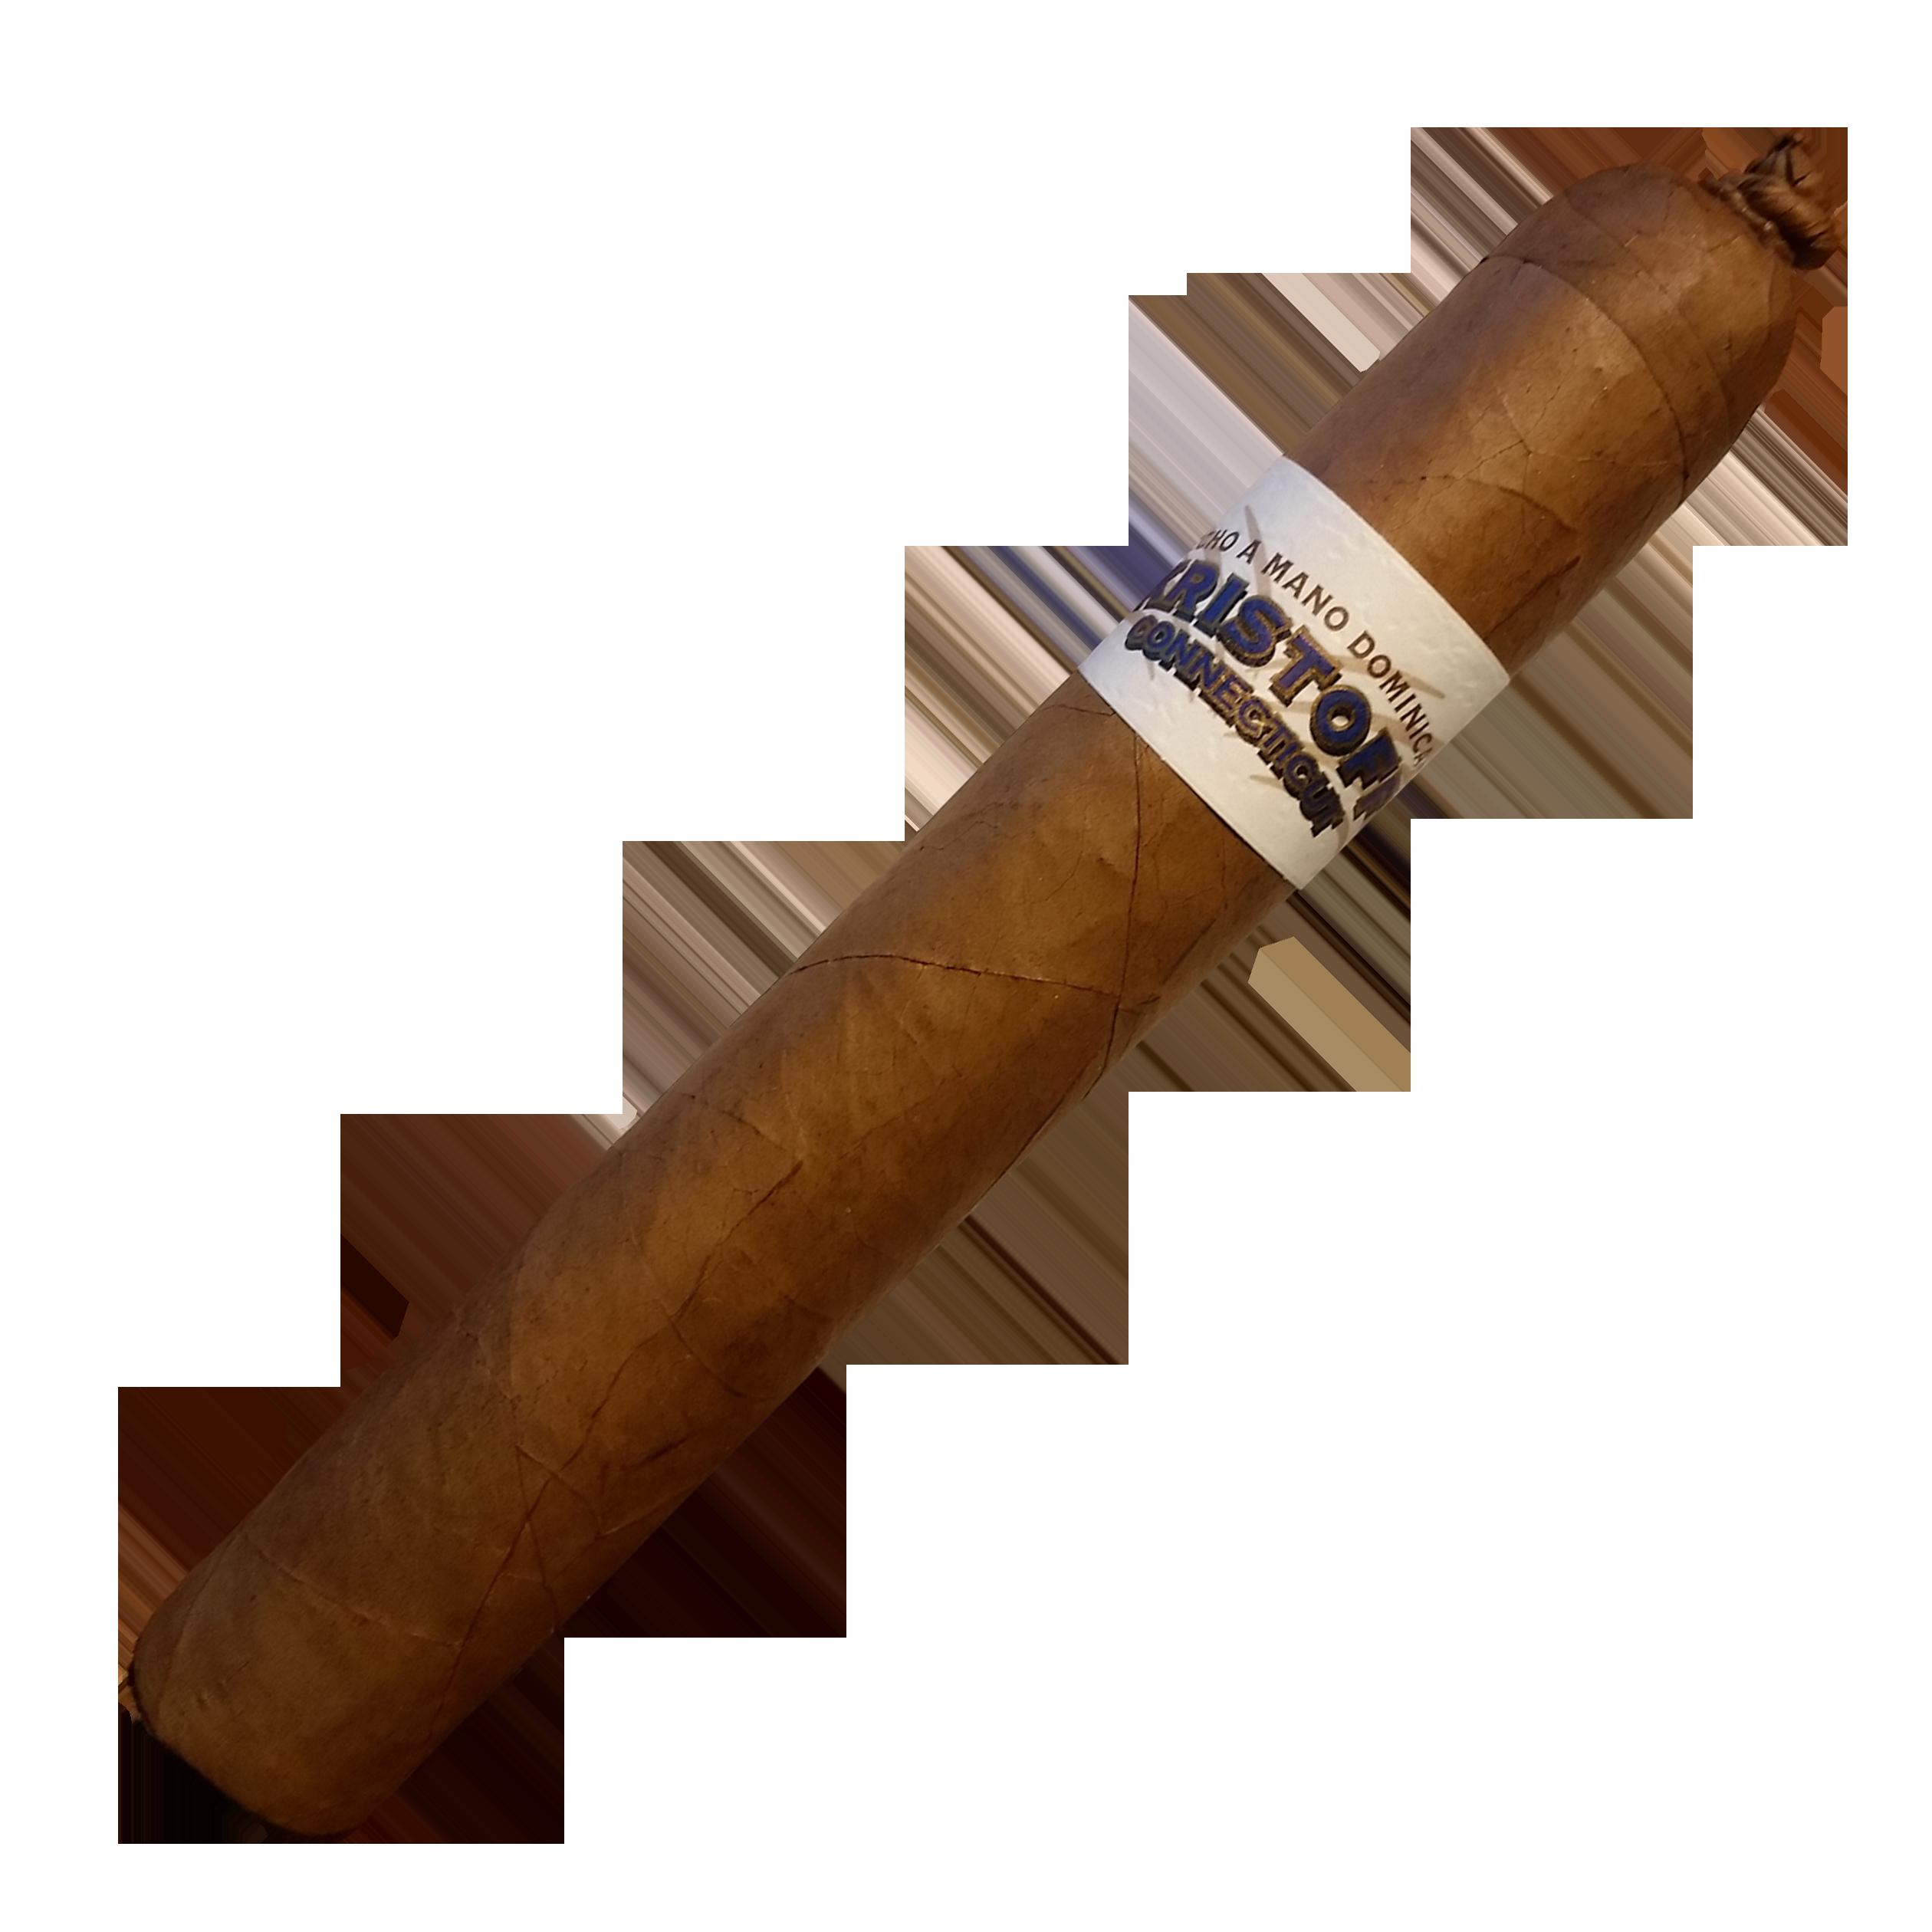 Kristoff Cigars | Connecticut